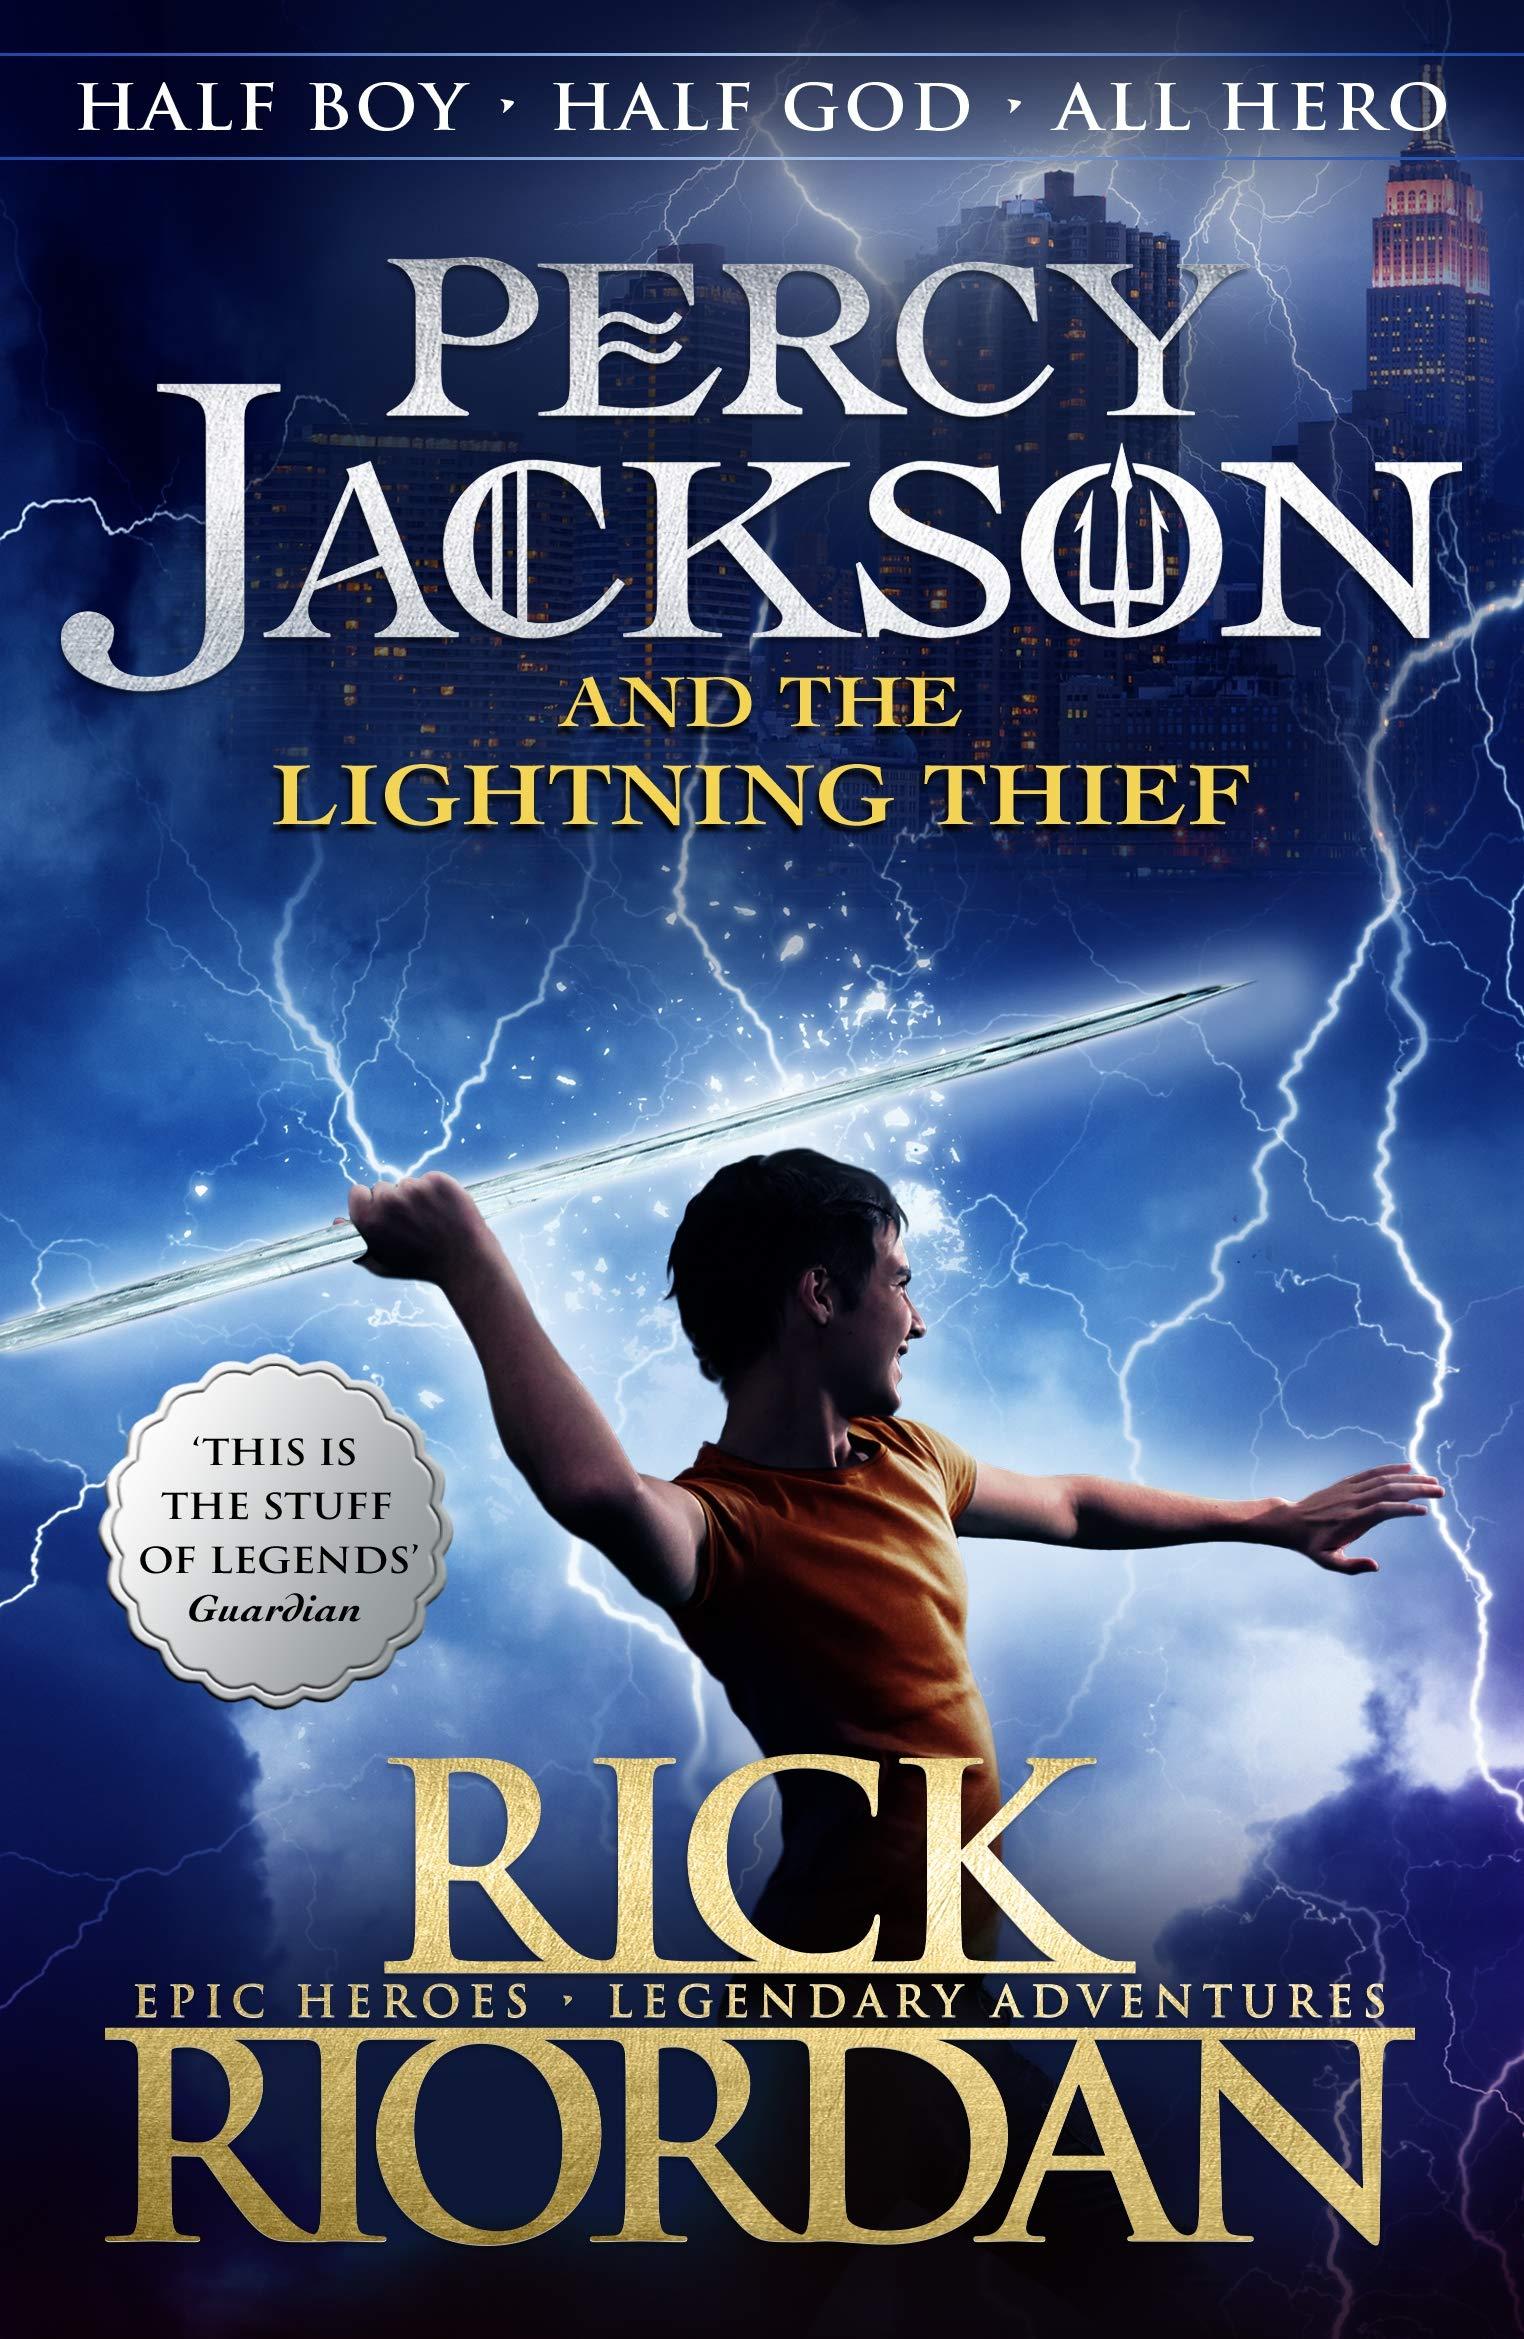 Percy Jackson and the Lightning Thief Book 1 of Percy Jackson:  Amazon.co.uk: Riordan, Rick: Books